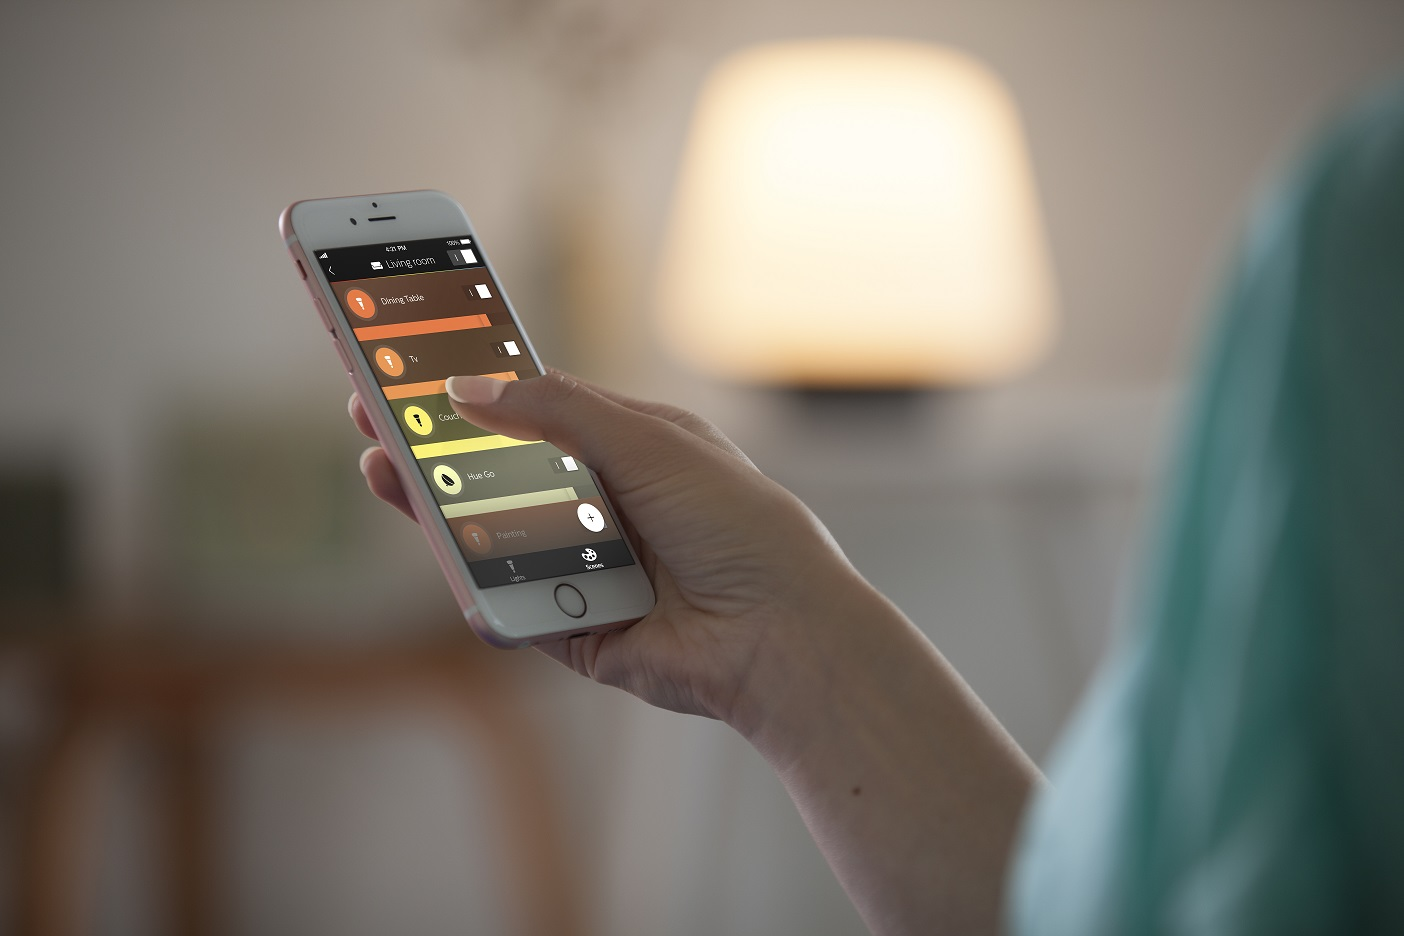 Philips Hue app 2.0